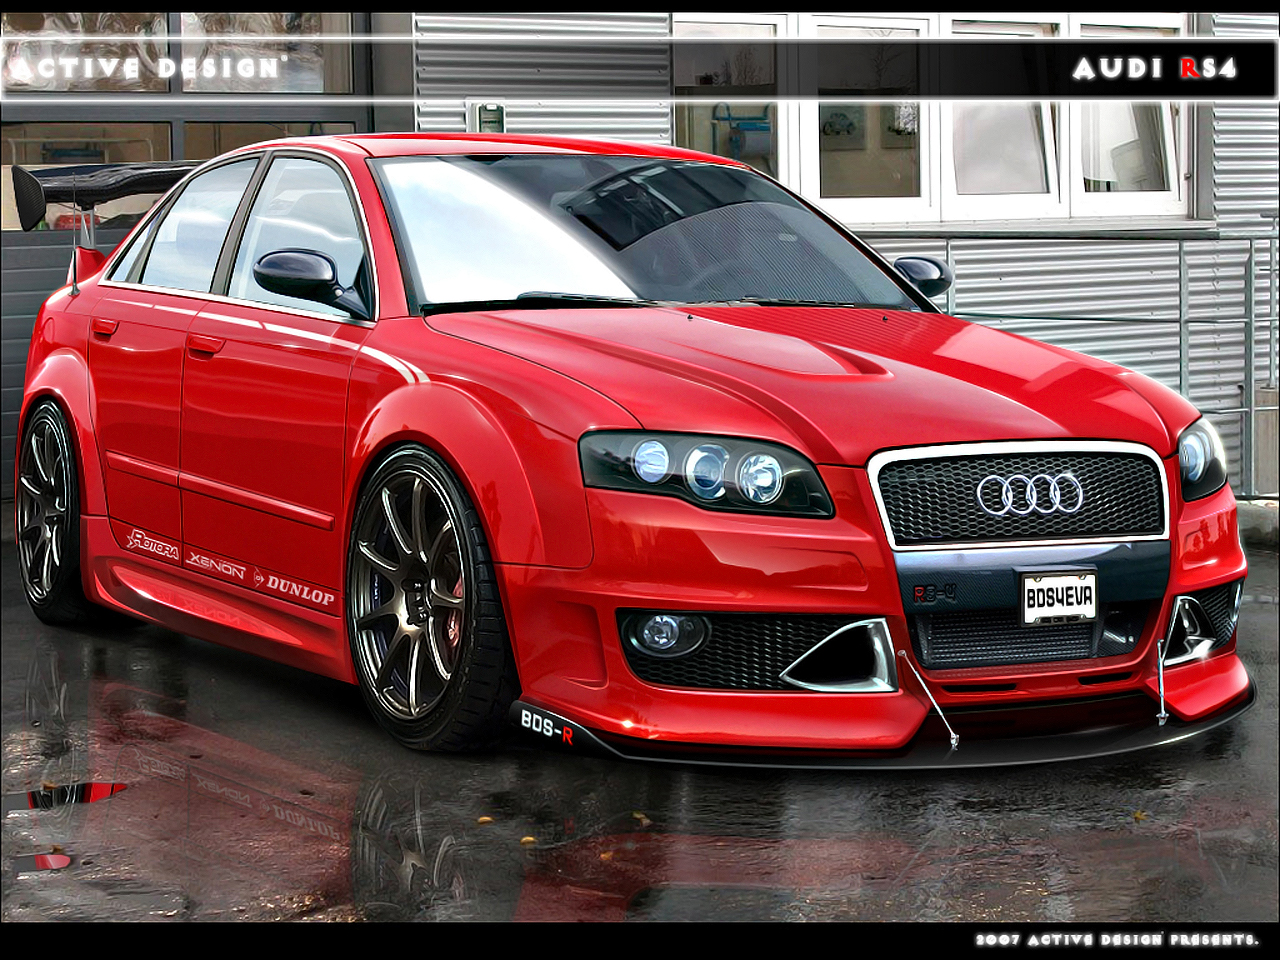 Audi RS By ActiveDesign On DeviantArt - Audi car origin